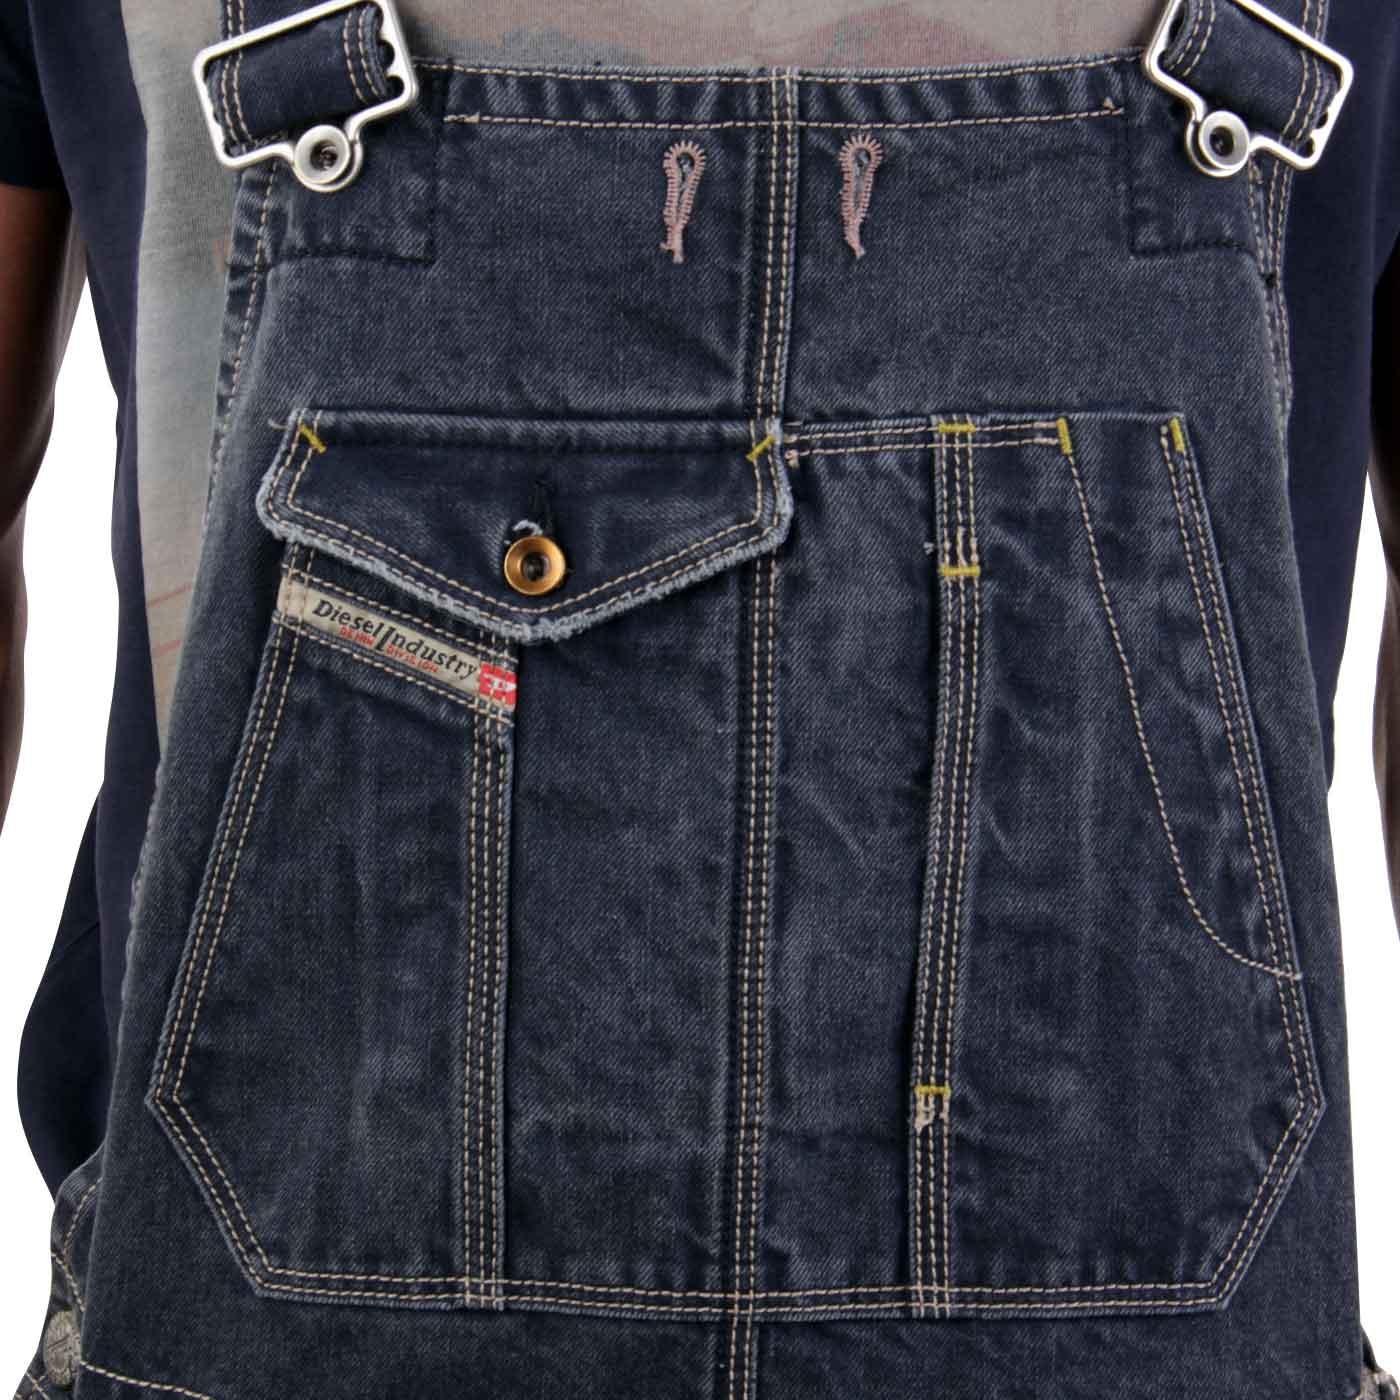 jeans latzhose levis herren jet lag herren latz jeans. Black Bedroom Furniture Sets. Home Design Ideas